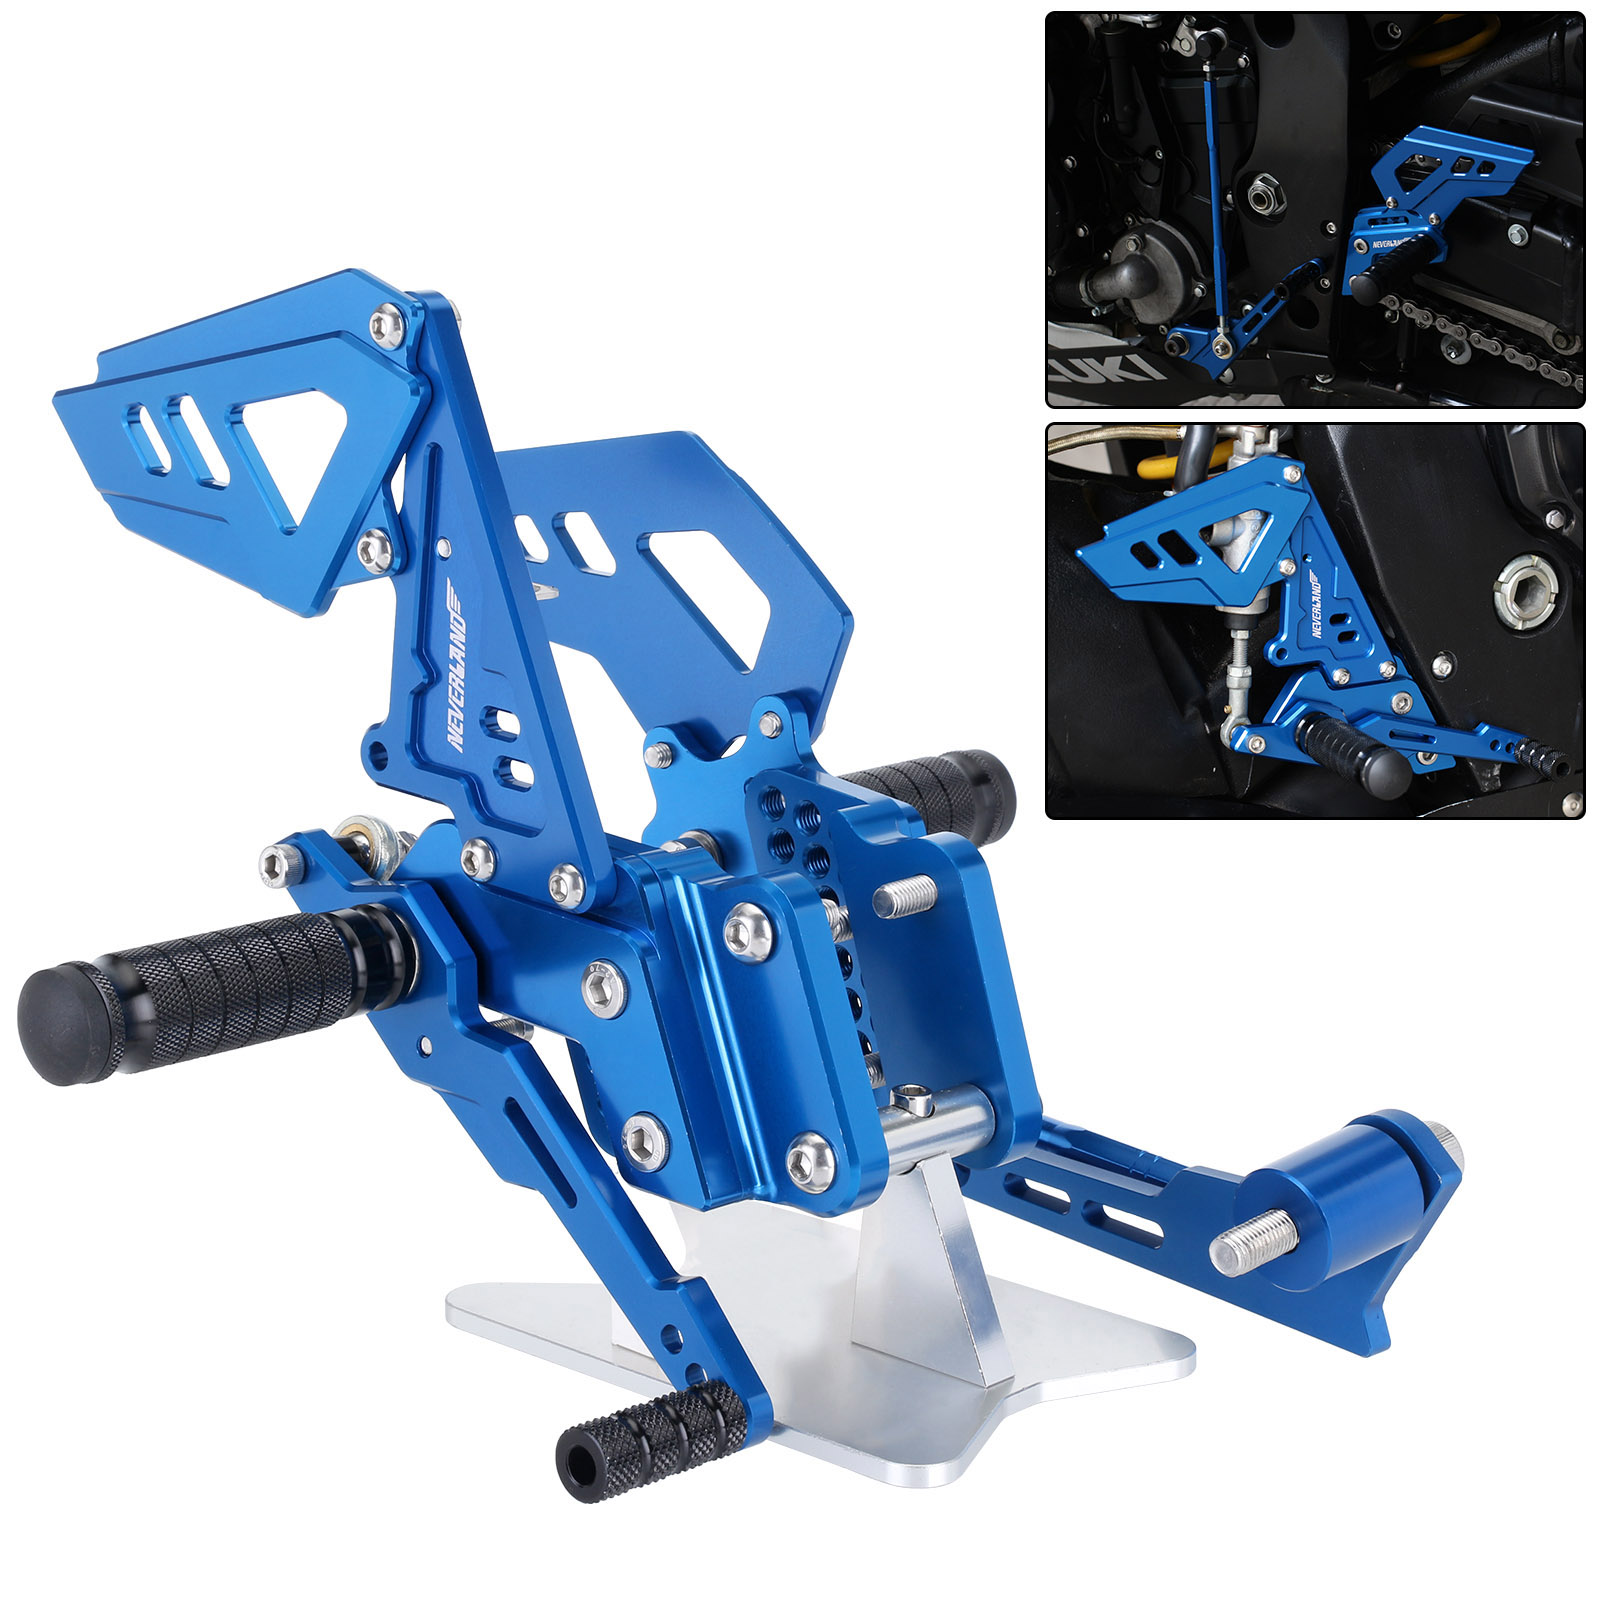 B Blue Black Style Motorcycle Footrest Rear Foot Pedal Pegs Set For Suzuli GSX R 600 750 GSX-R GSXR D40